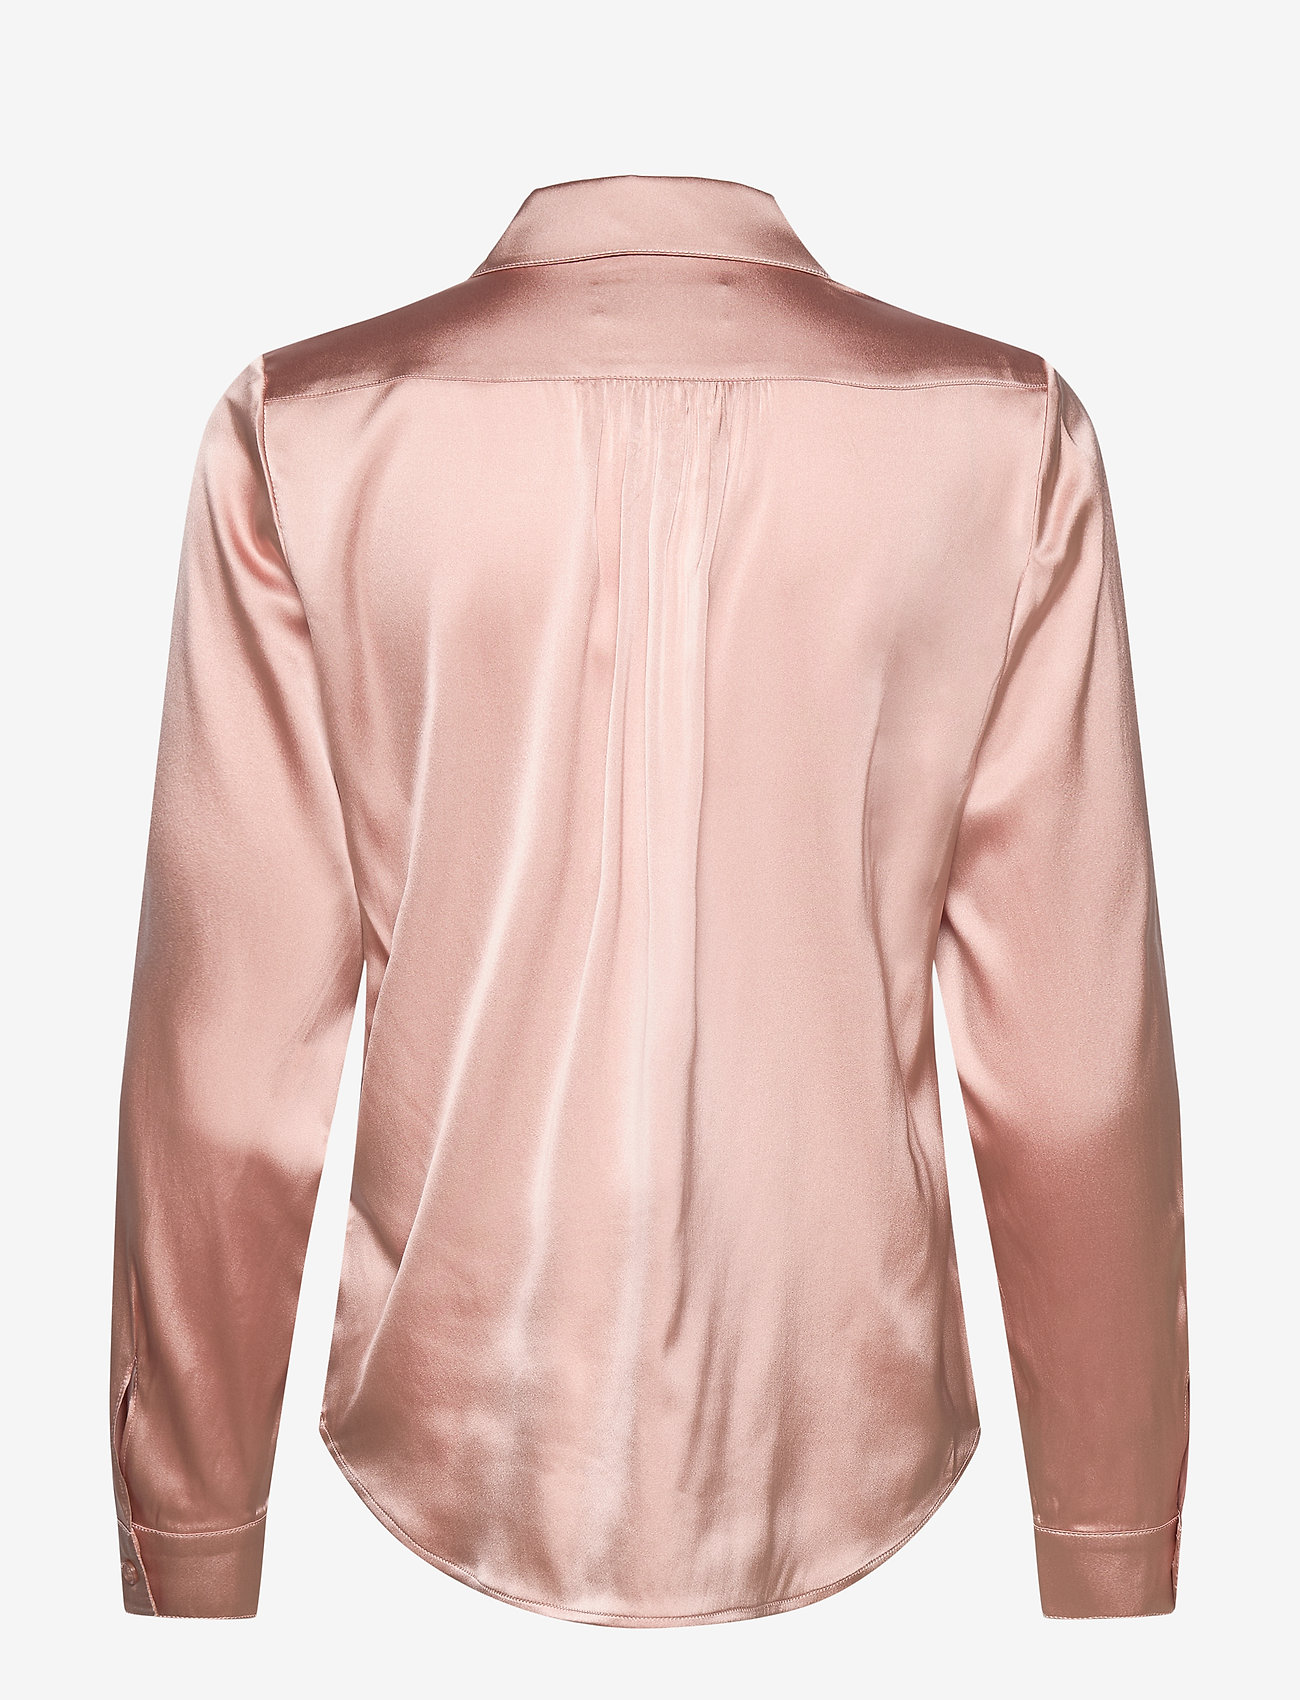 SAND - 3176 - Latia - chemises à manches longues - dark nude - 1